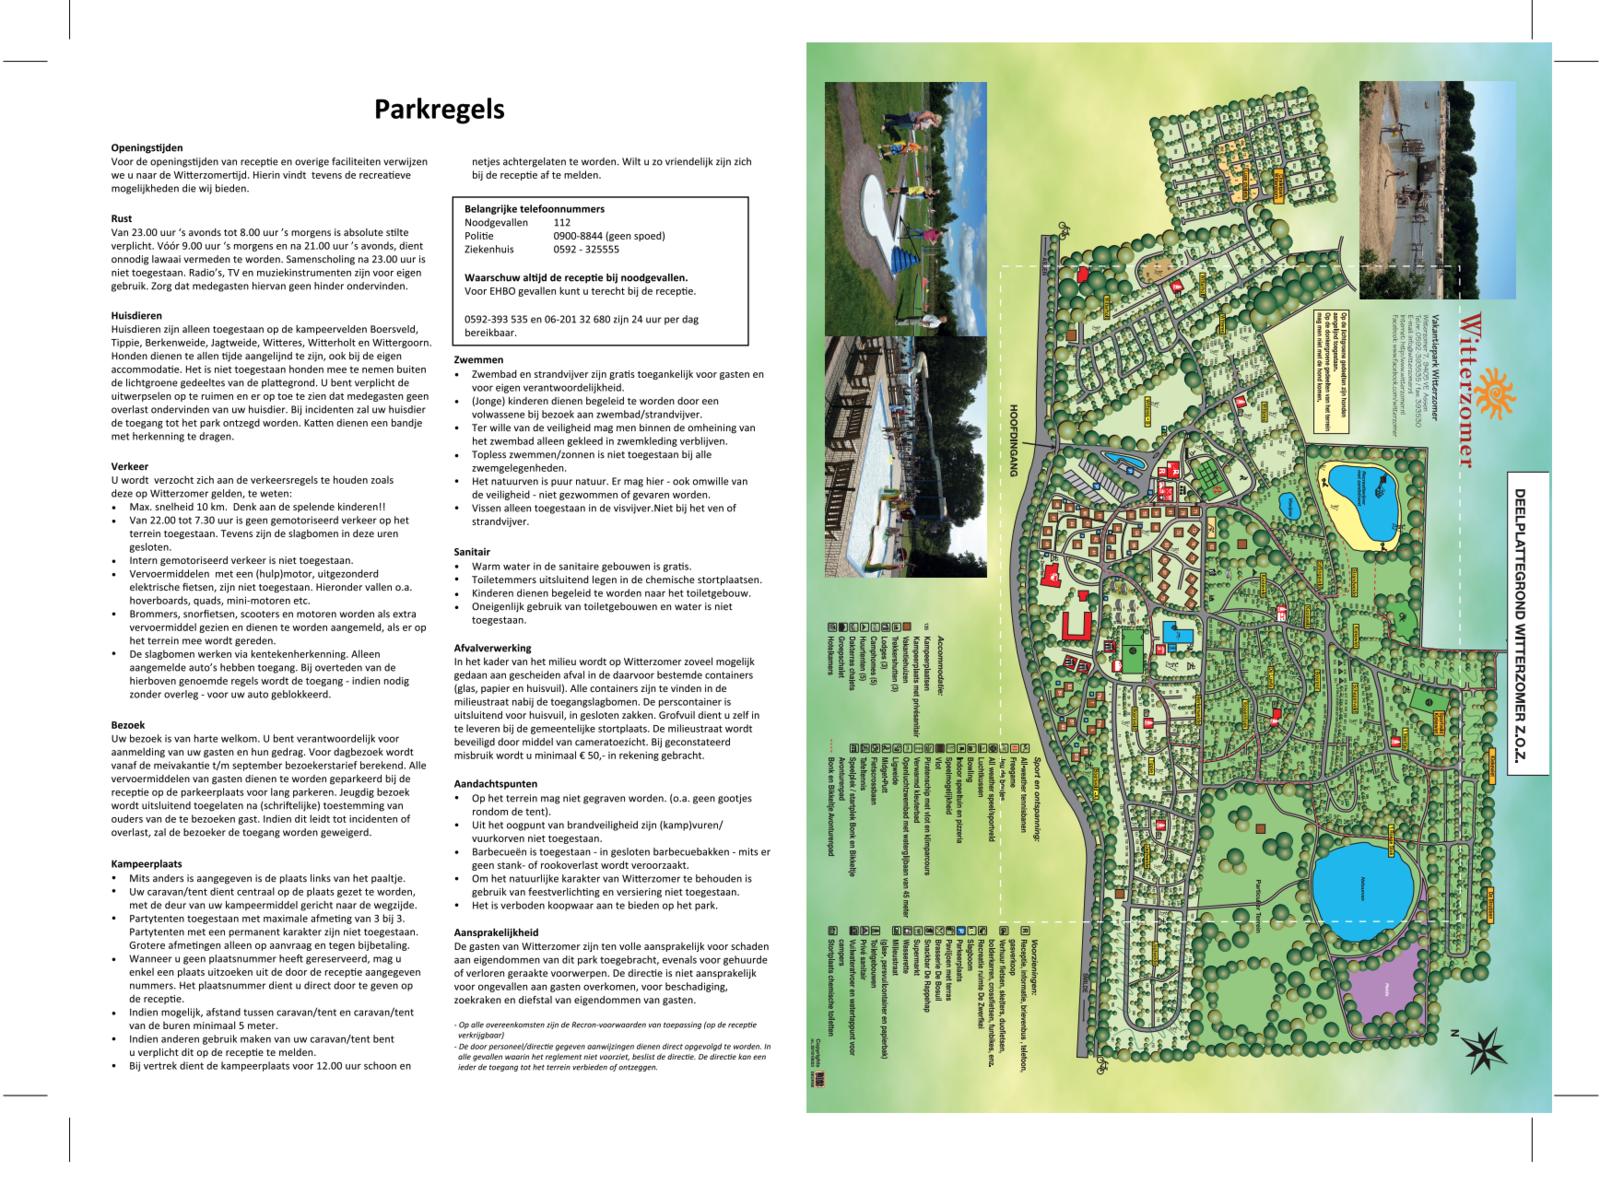 WITTERZOMER_A3_achterkant_ca5f8e88-ac3a-42f2-a067-e5bca2a64c6a.pdf